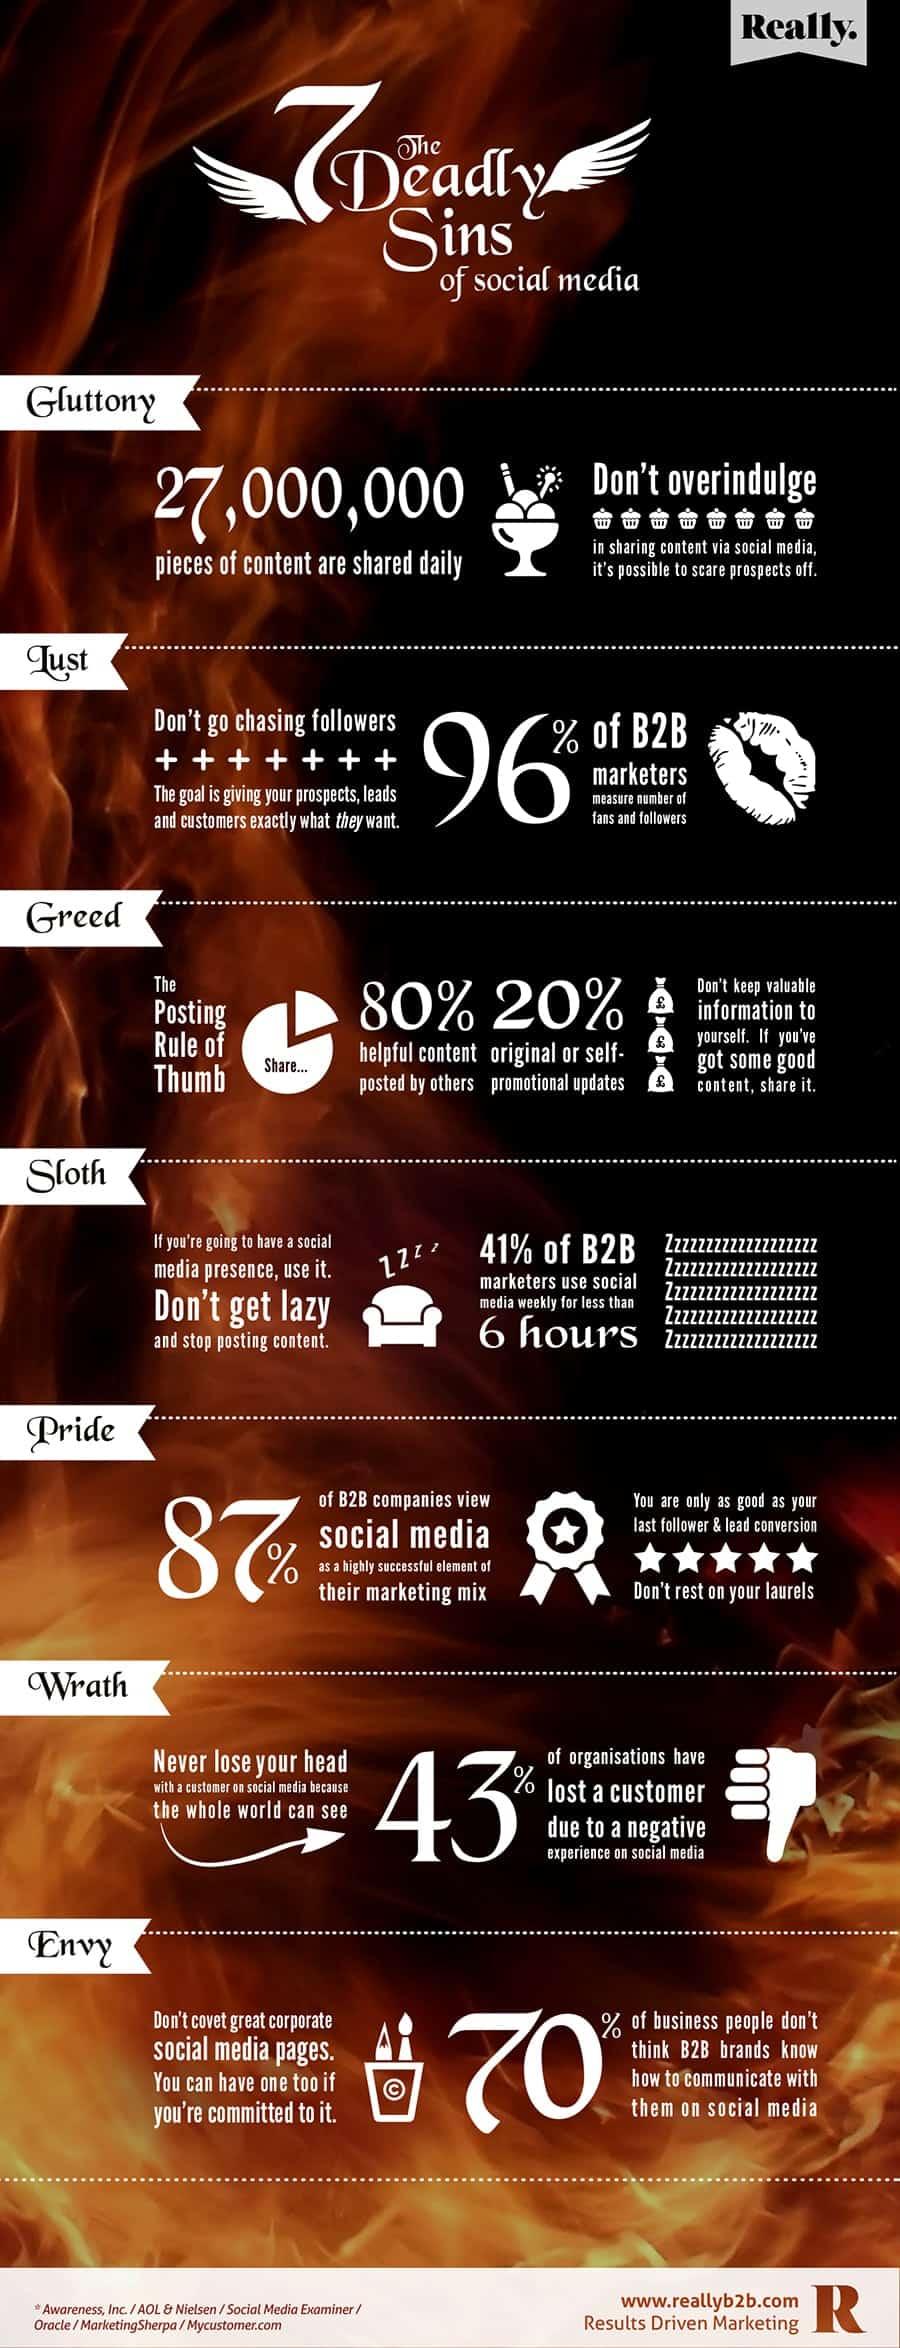 7 Social Media Marketing Mistakes to Avoid [Infographic]